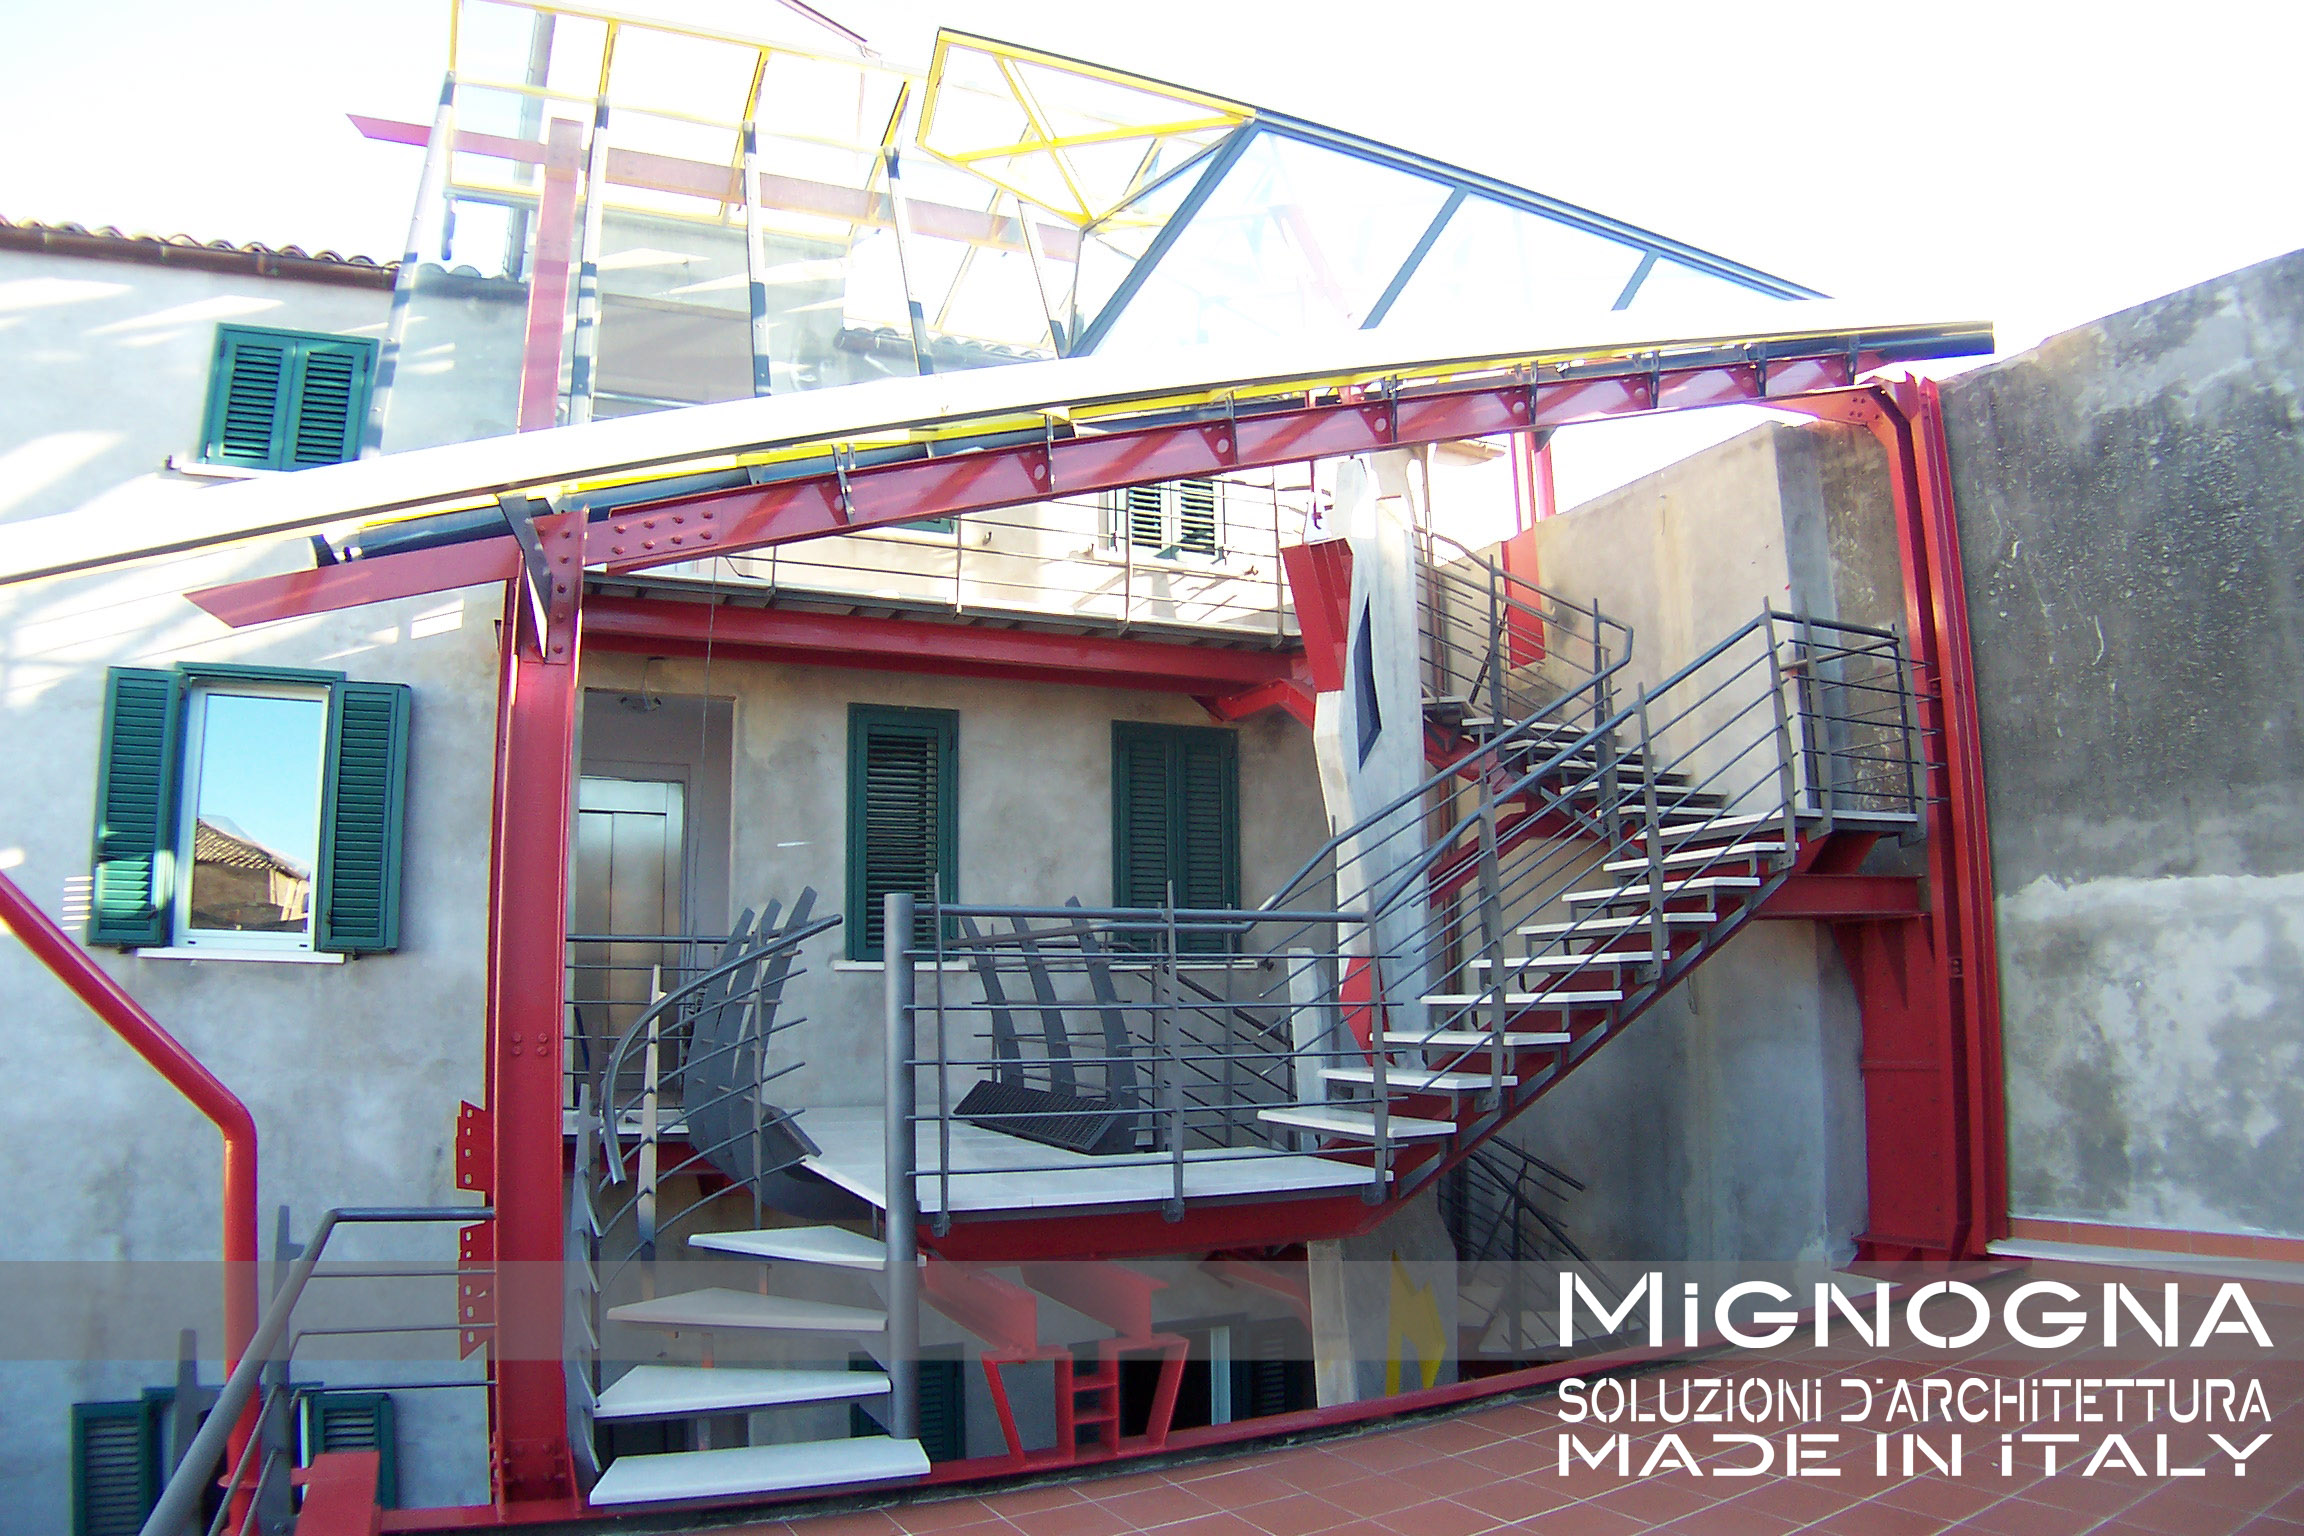 Scale Design Mignogna Srl